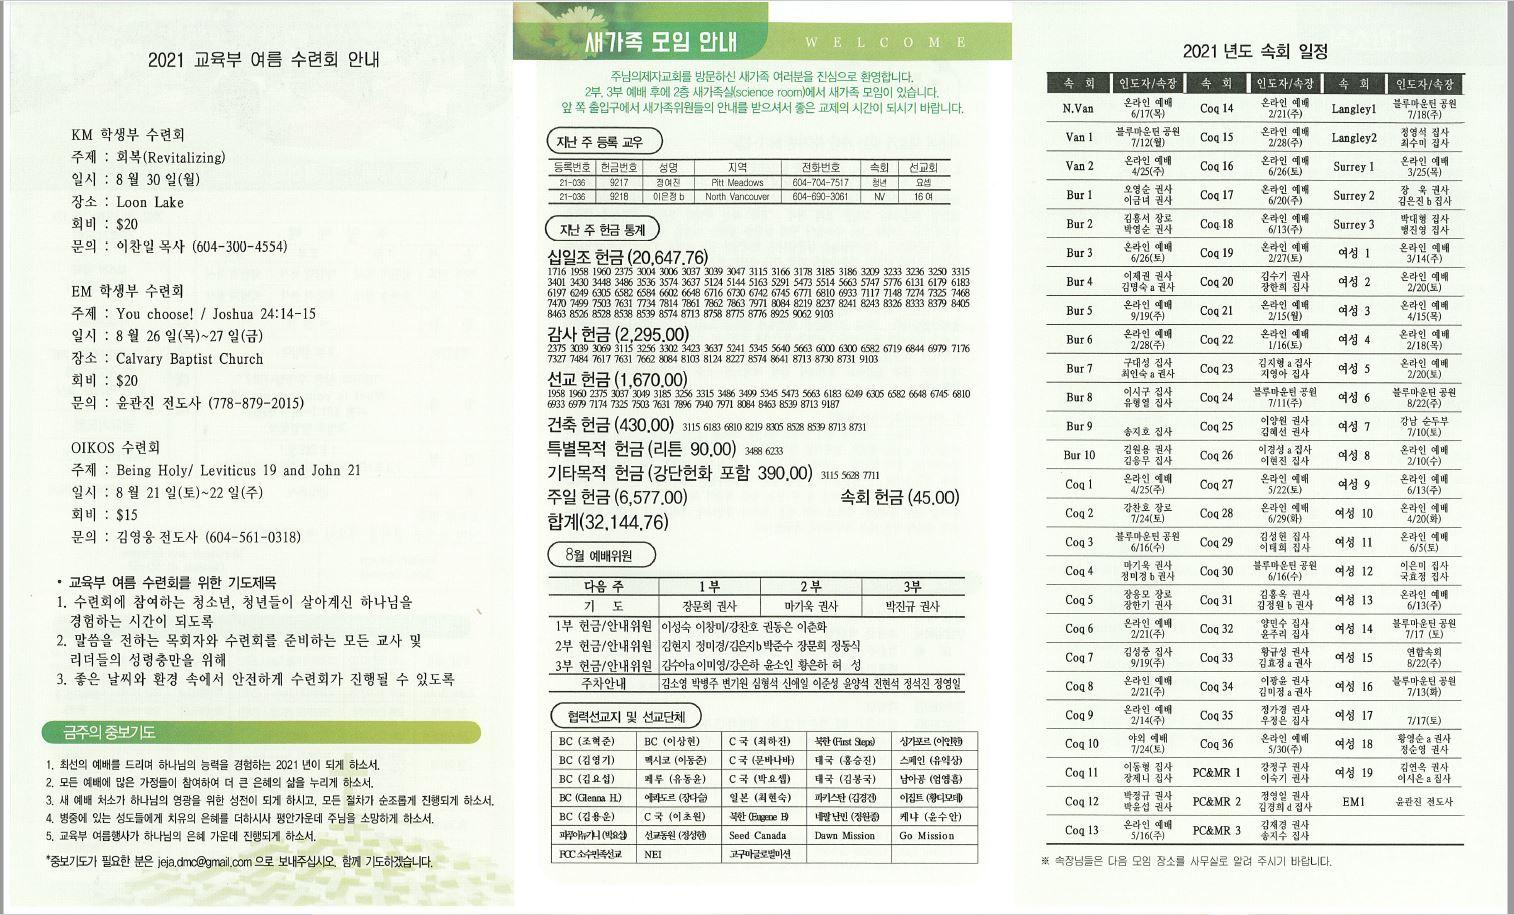 mb-file.php?path=2021%2F08%2F13%2FF2636_Capture-1.JPG